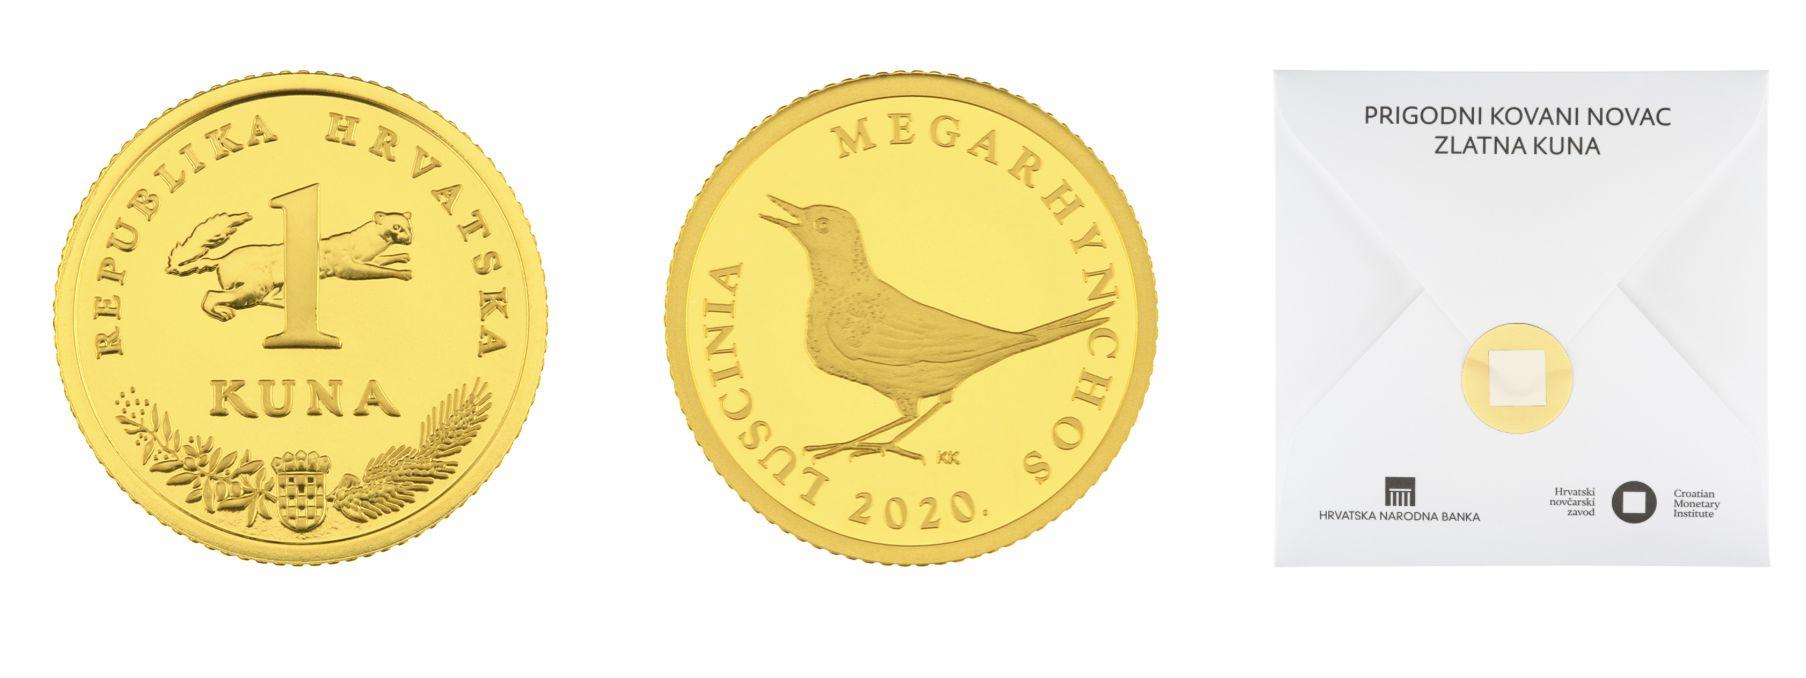 croatian gold coin one kuna